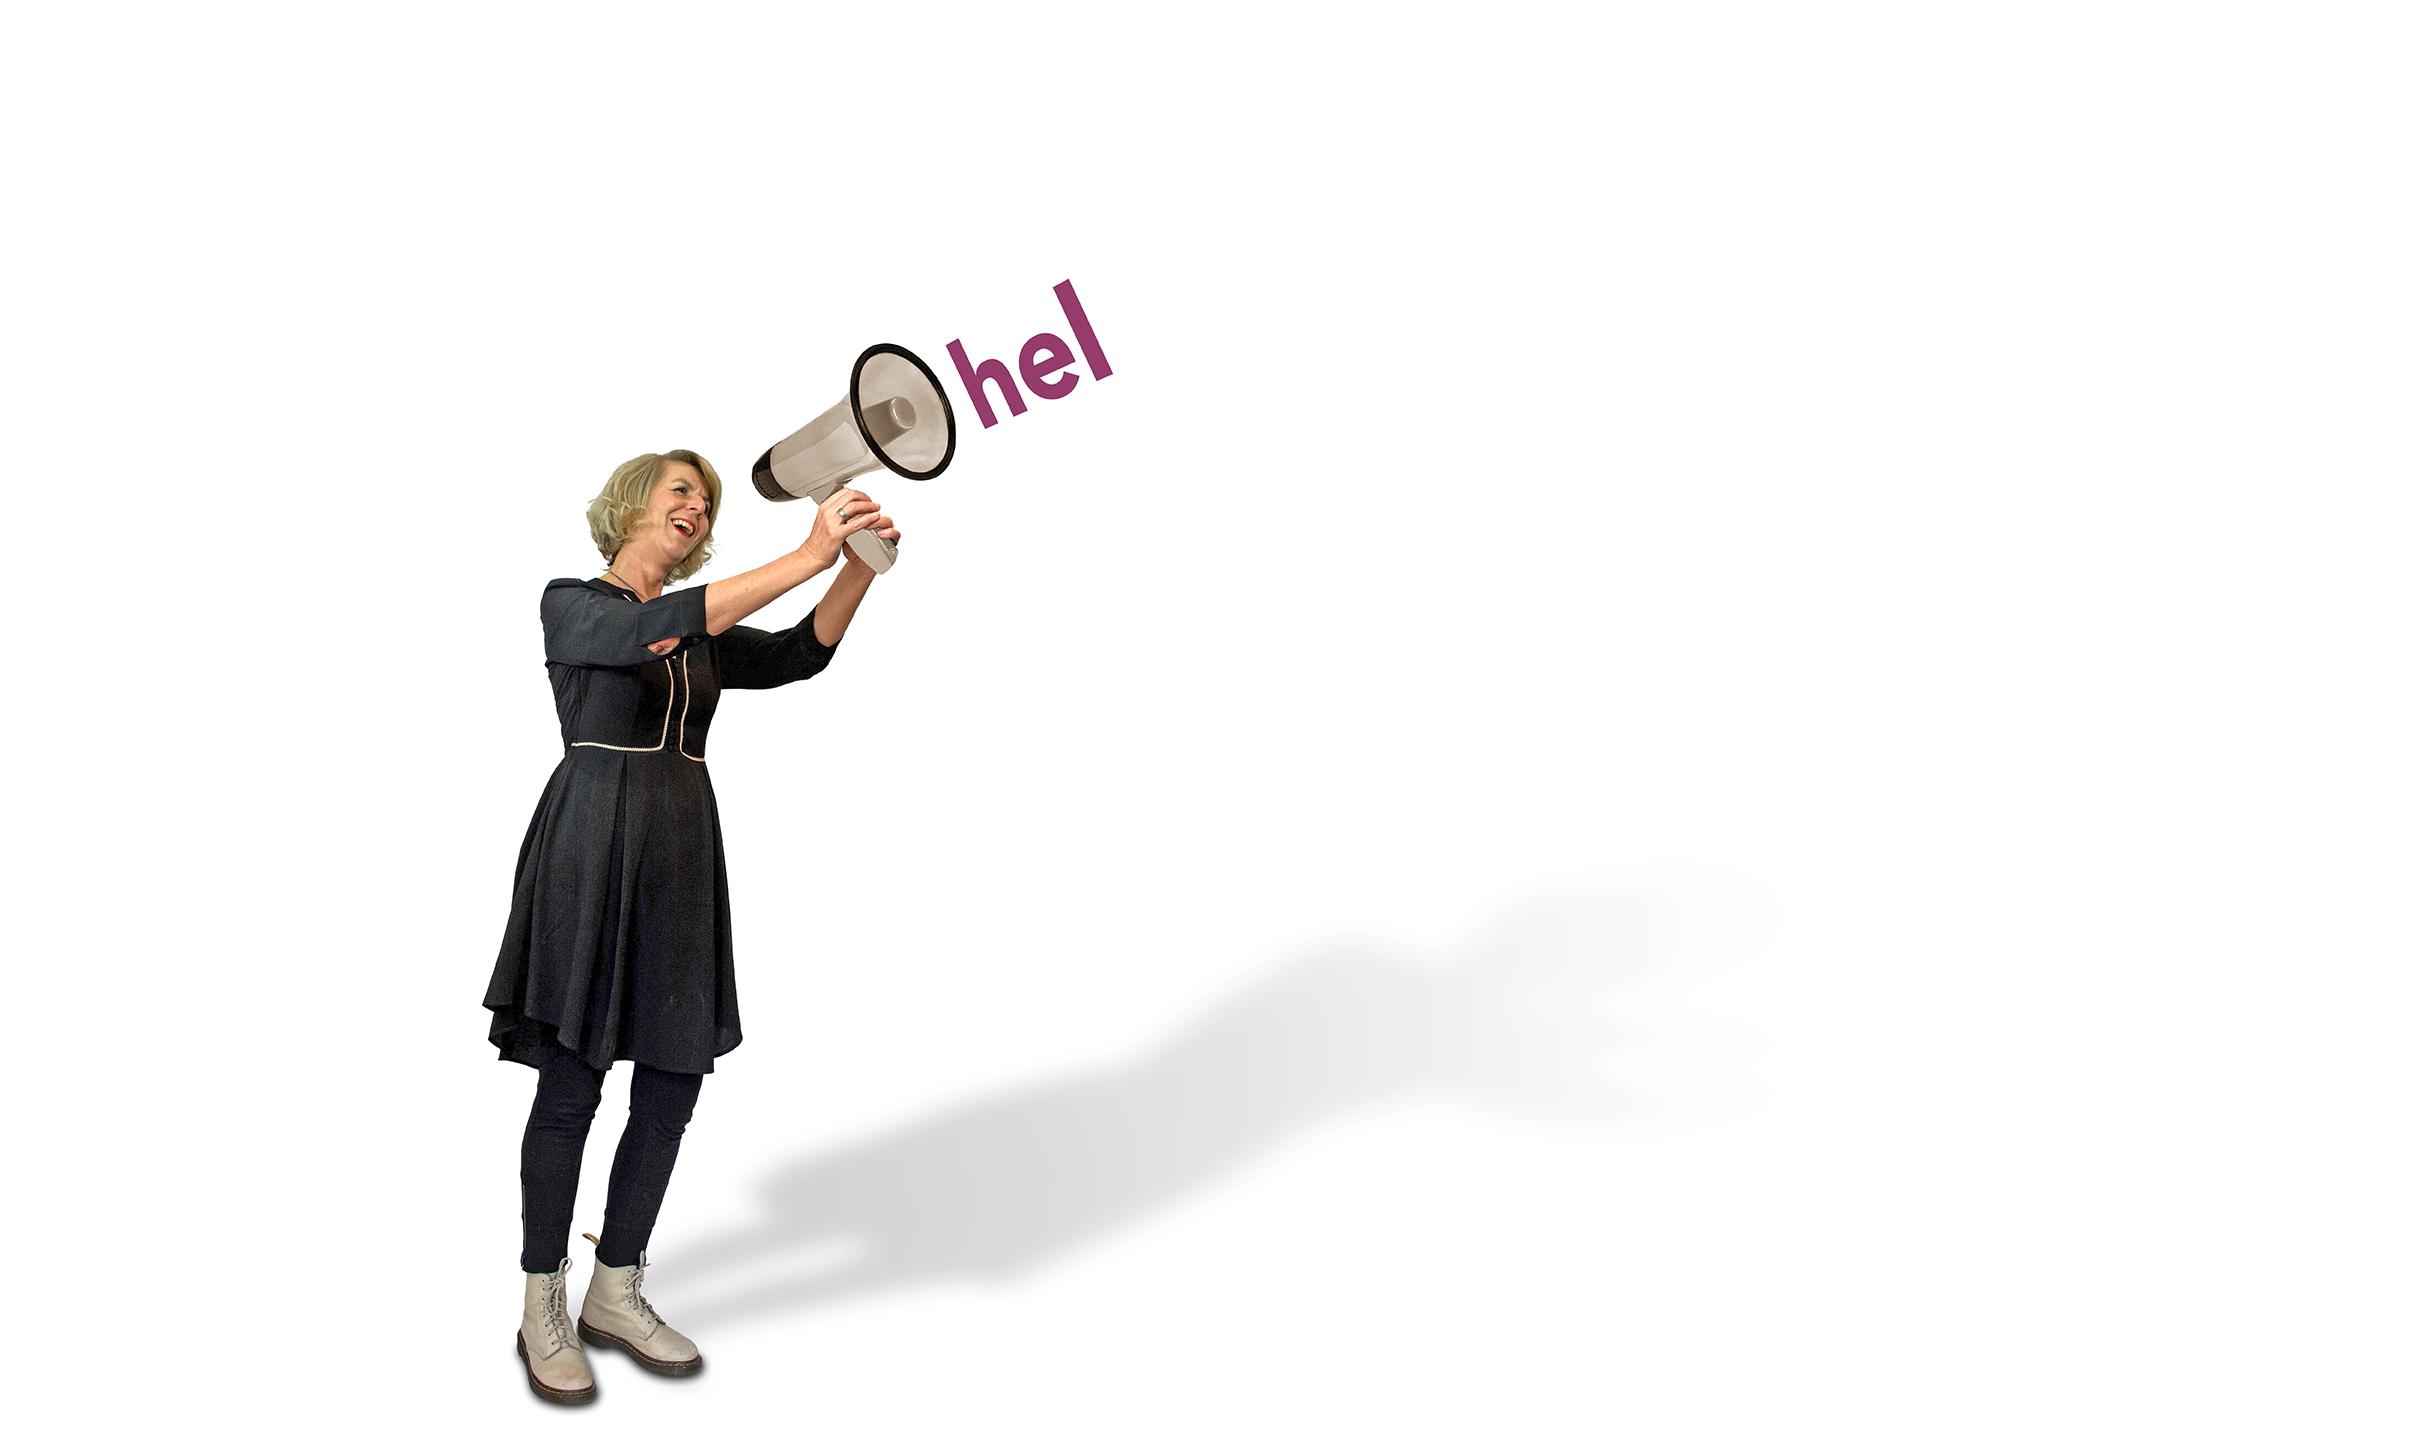 Hello_hel